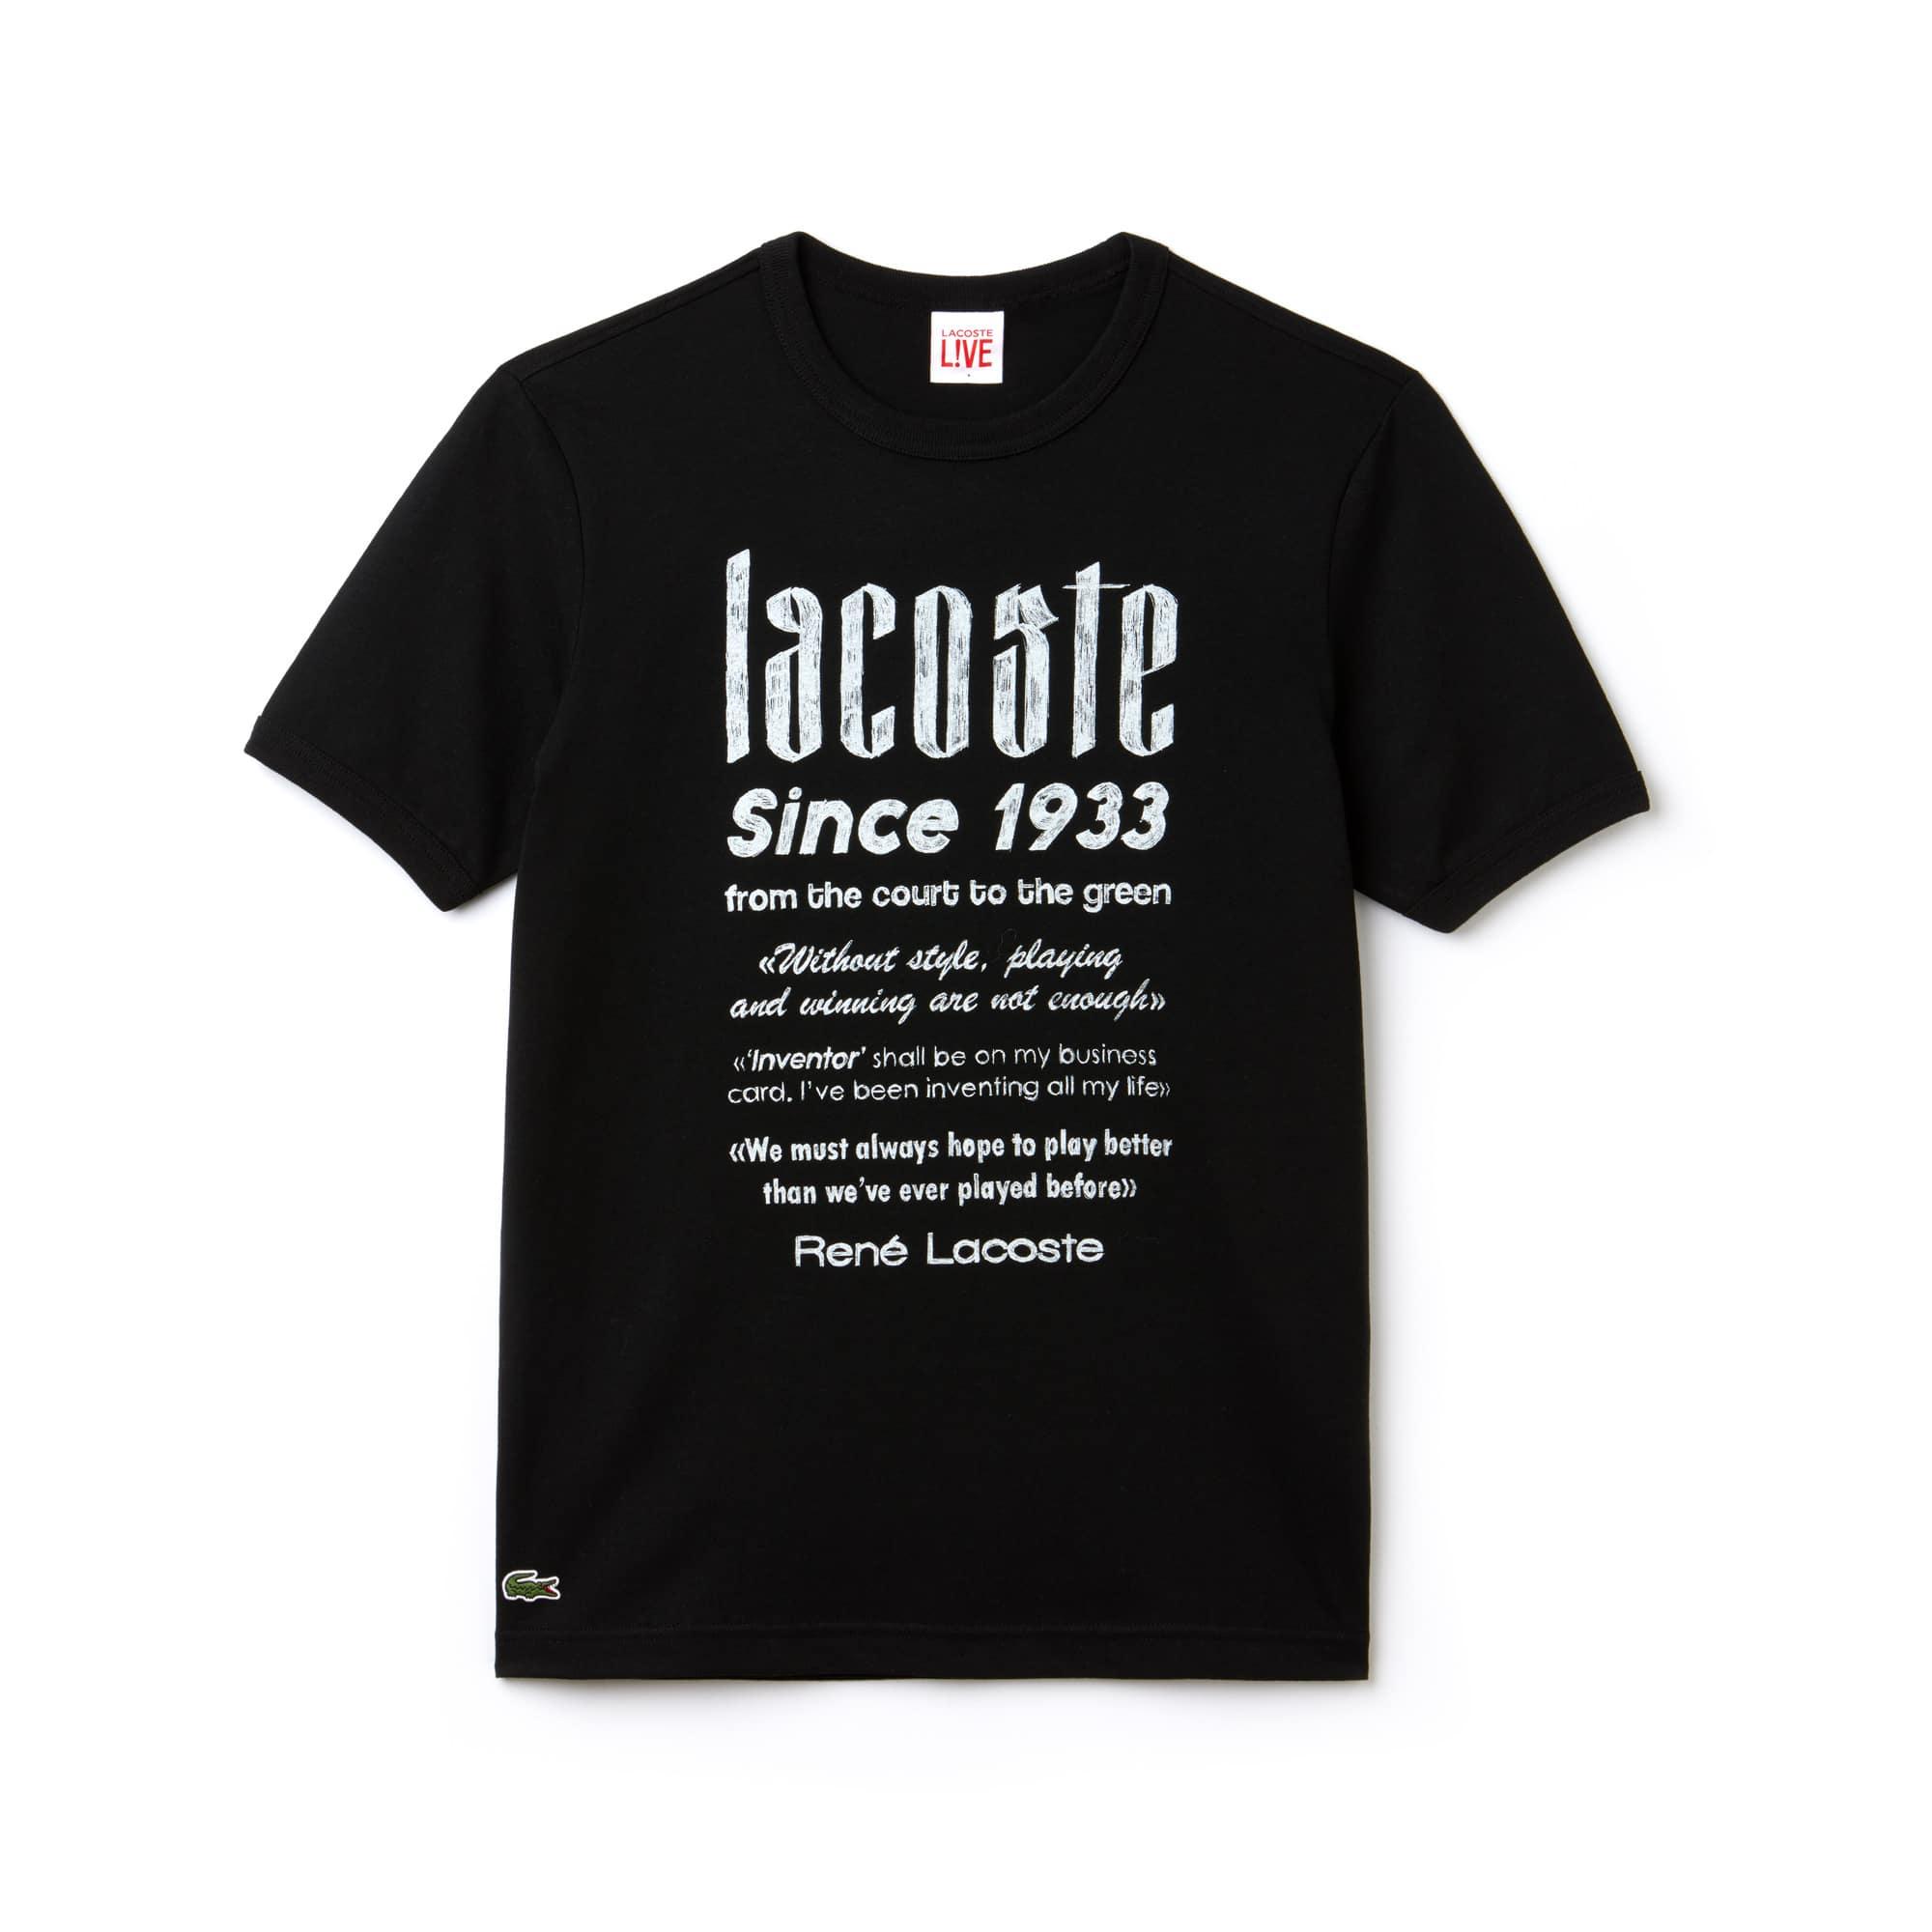 Men's LIVE Crew Neck Heritage Print Cotton Jersey T-shirt